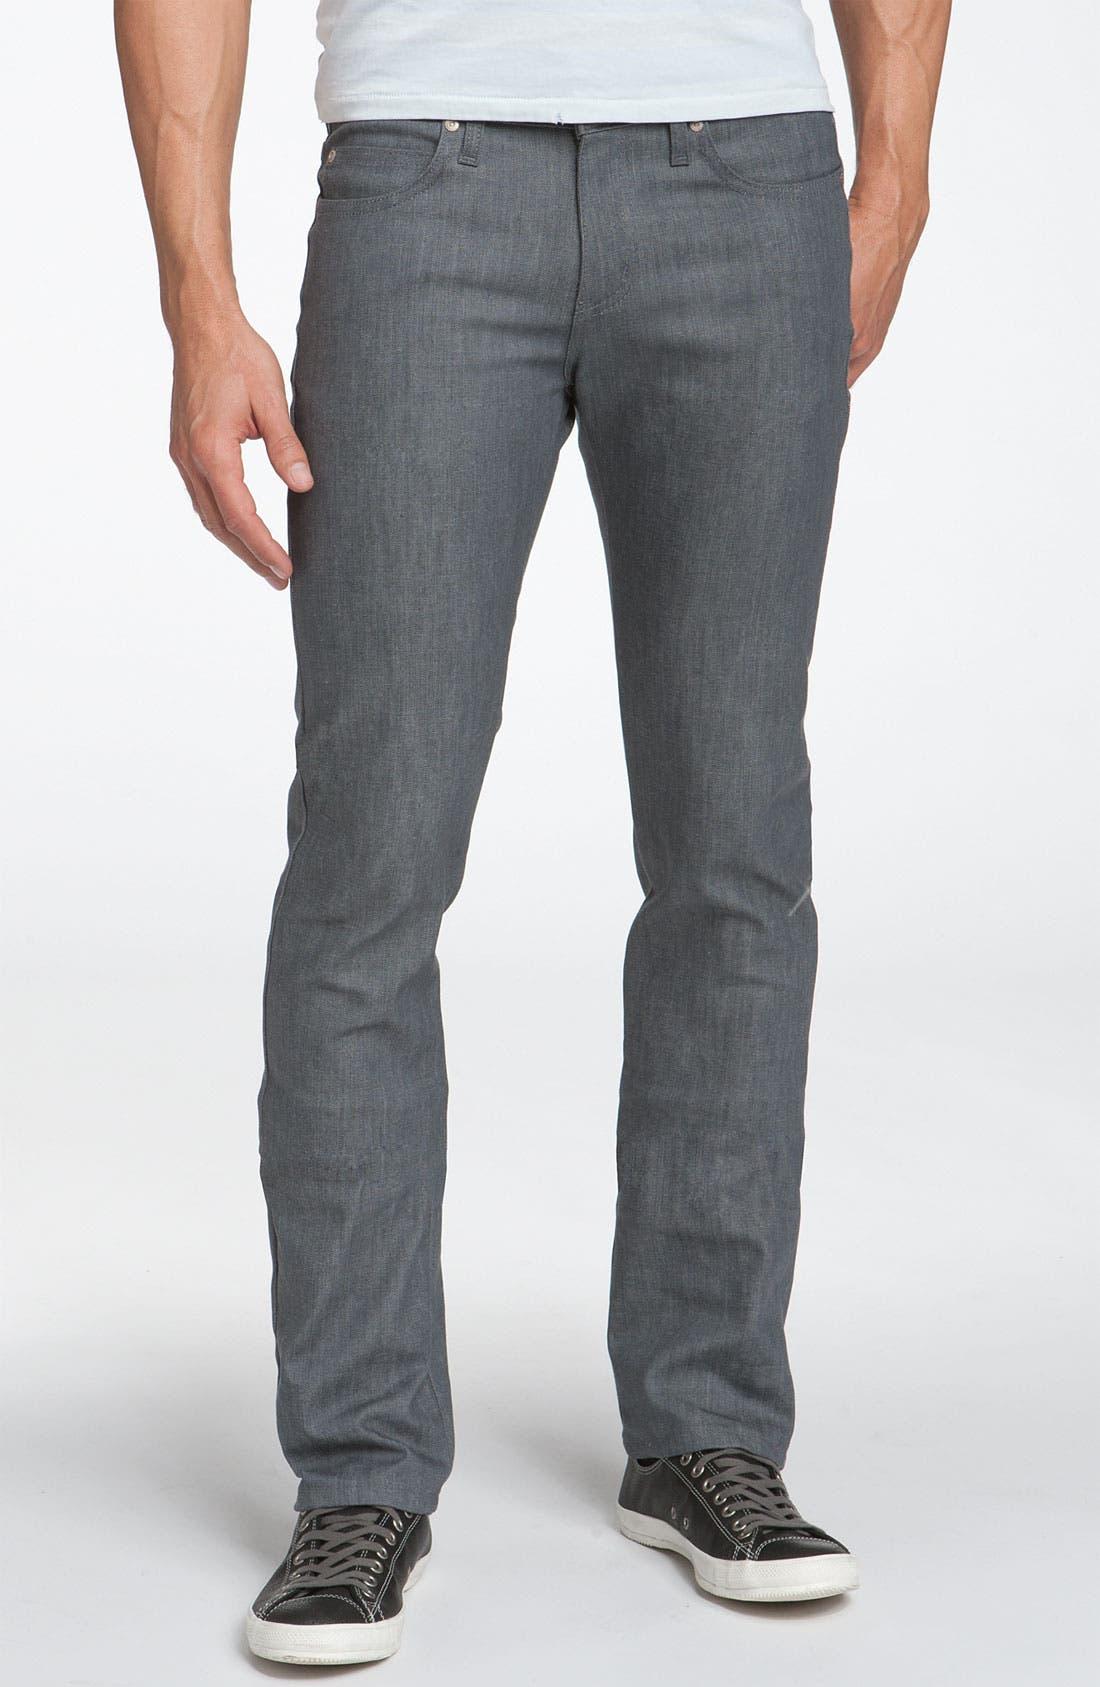 NAKED & FAMOUS DENIM 'Skinny Guy' Skinny Fit Jeans, Main, color, 060